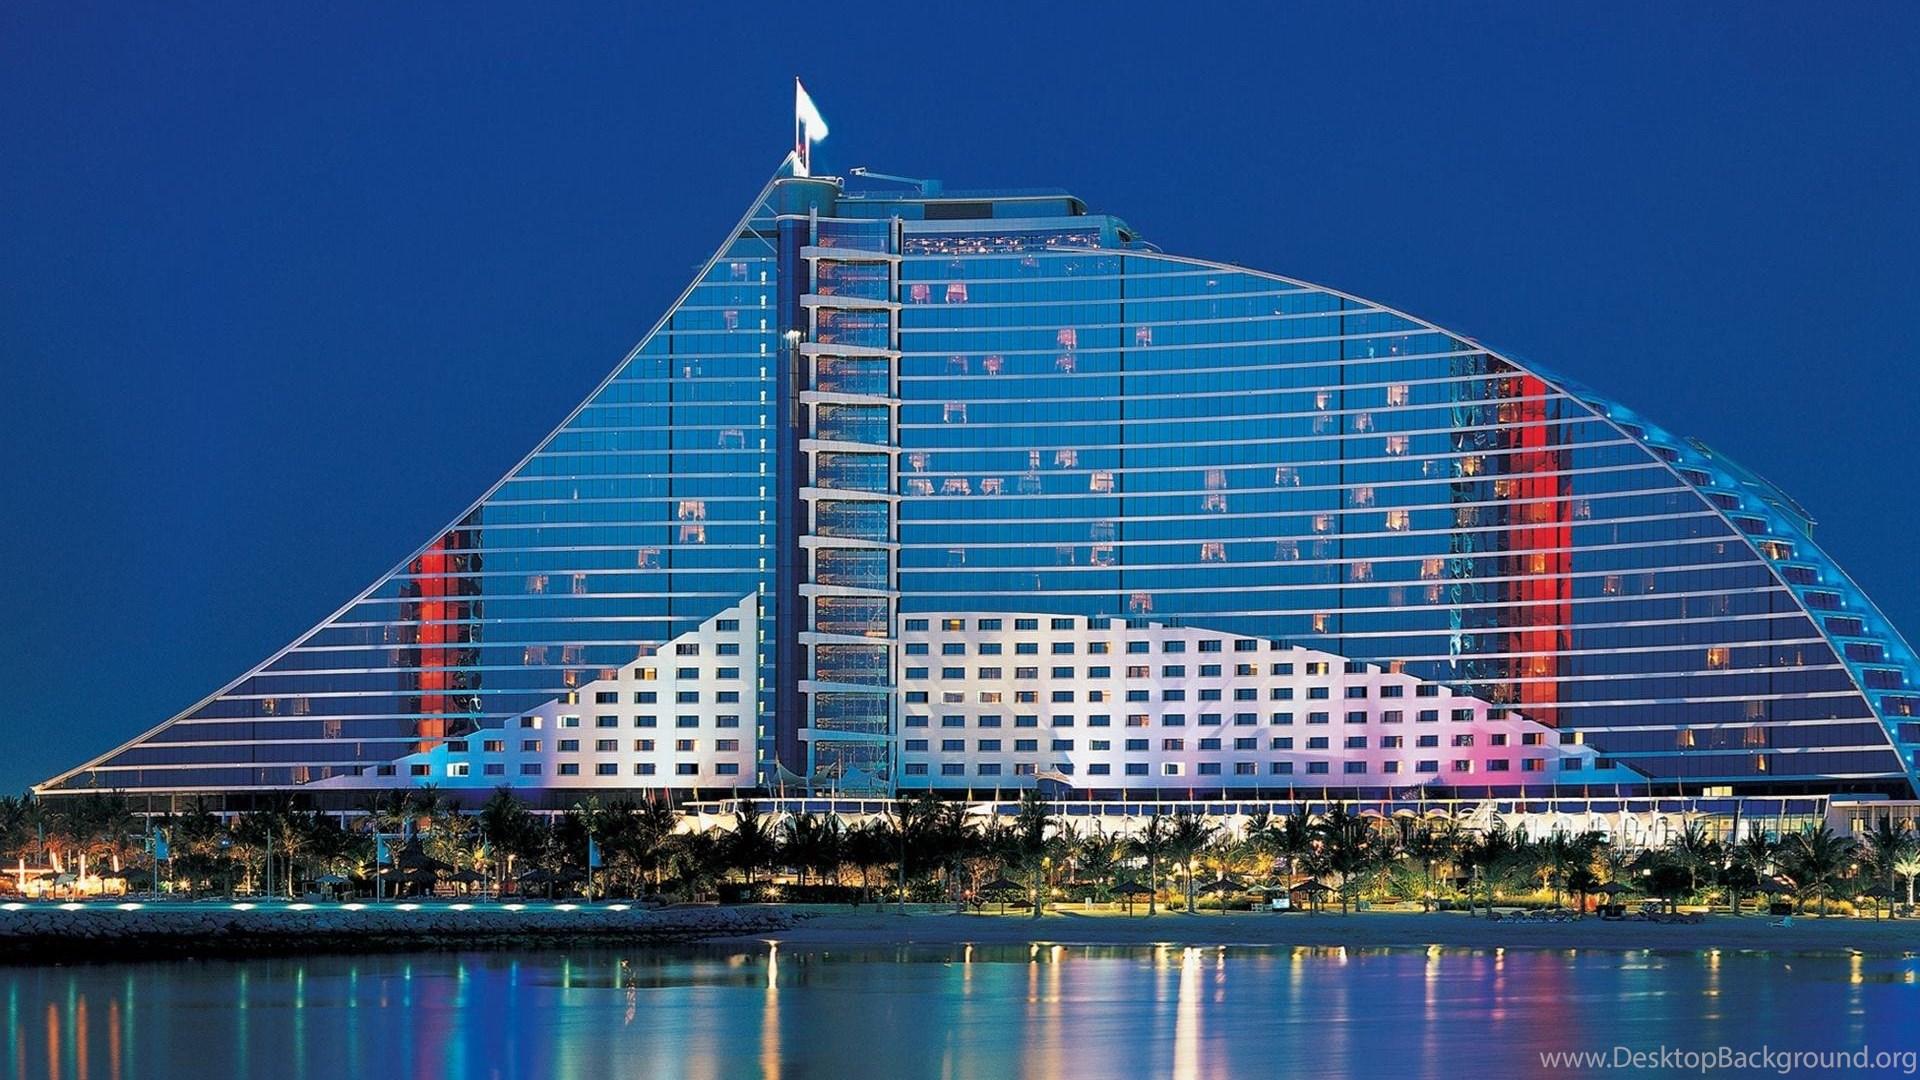 Dubai Uae Jumeirah Beach Hotel Hd Wallpapers Desktop Background Follow the vibe and change your wallpaper every day! dubai uae jumeirah beach hotel hd